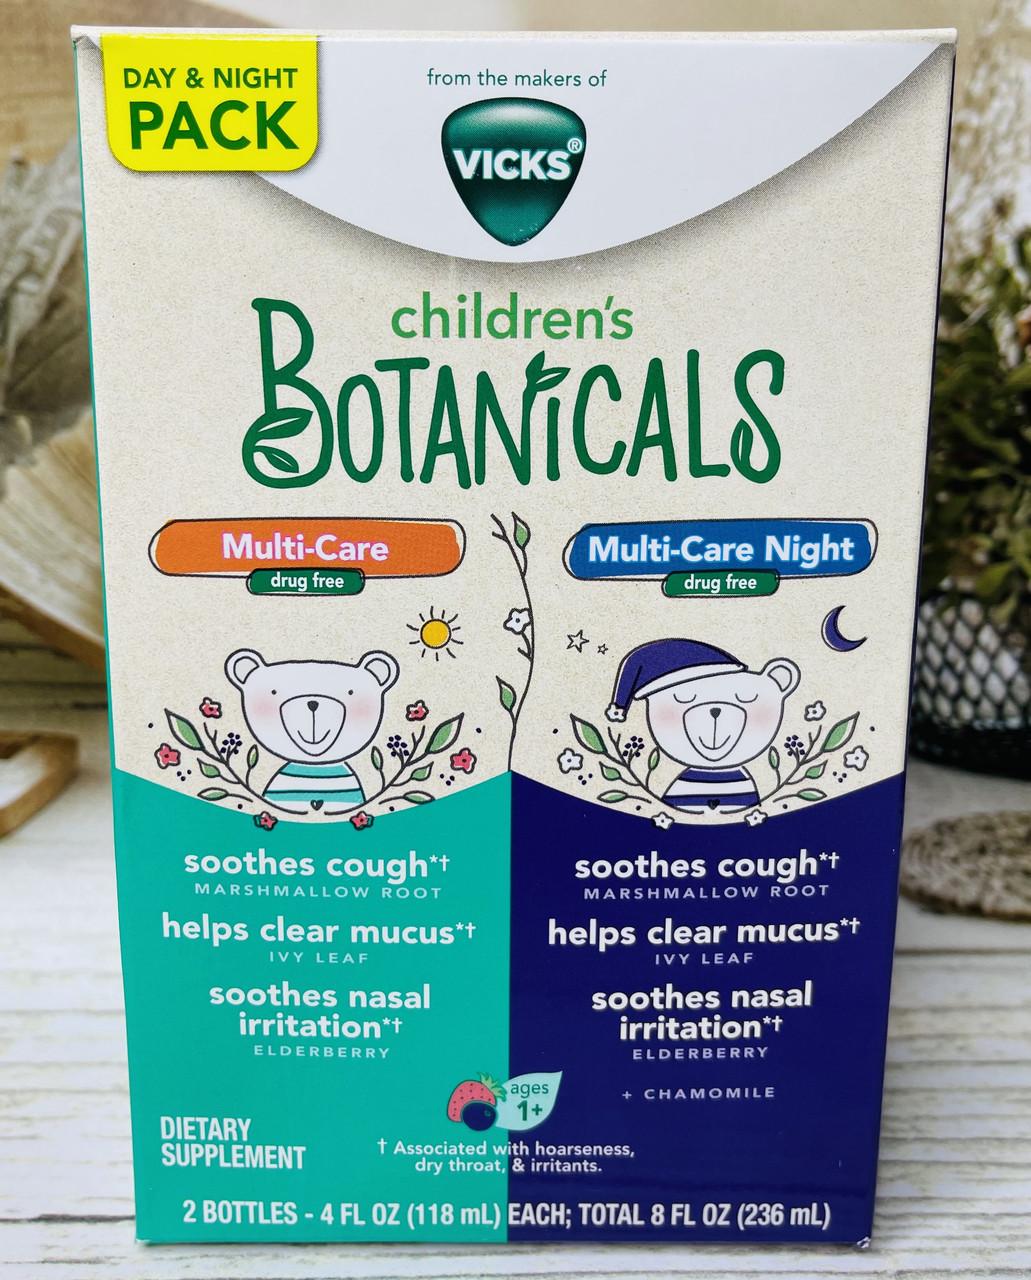 Дитячі сиропи від кашлю та застуди Vicks children's Botanicals